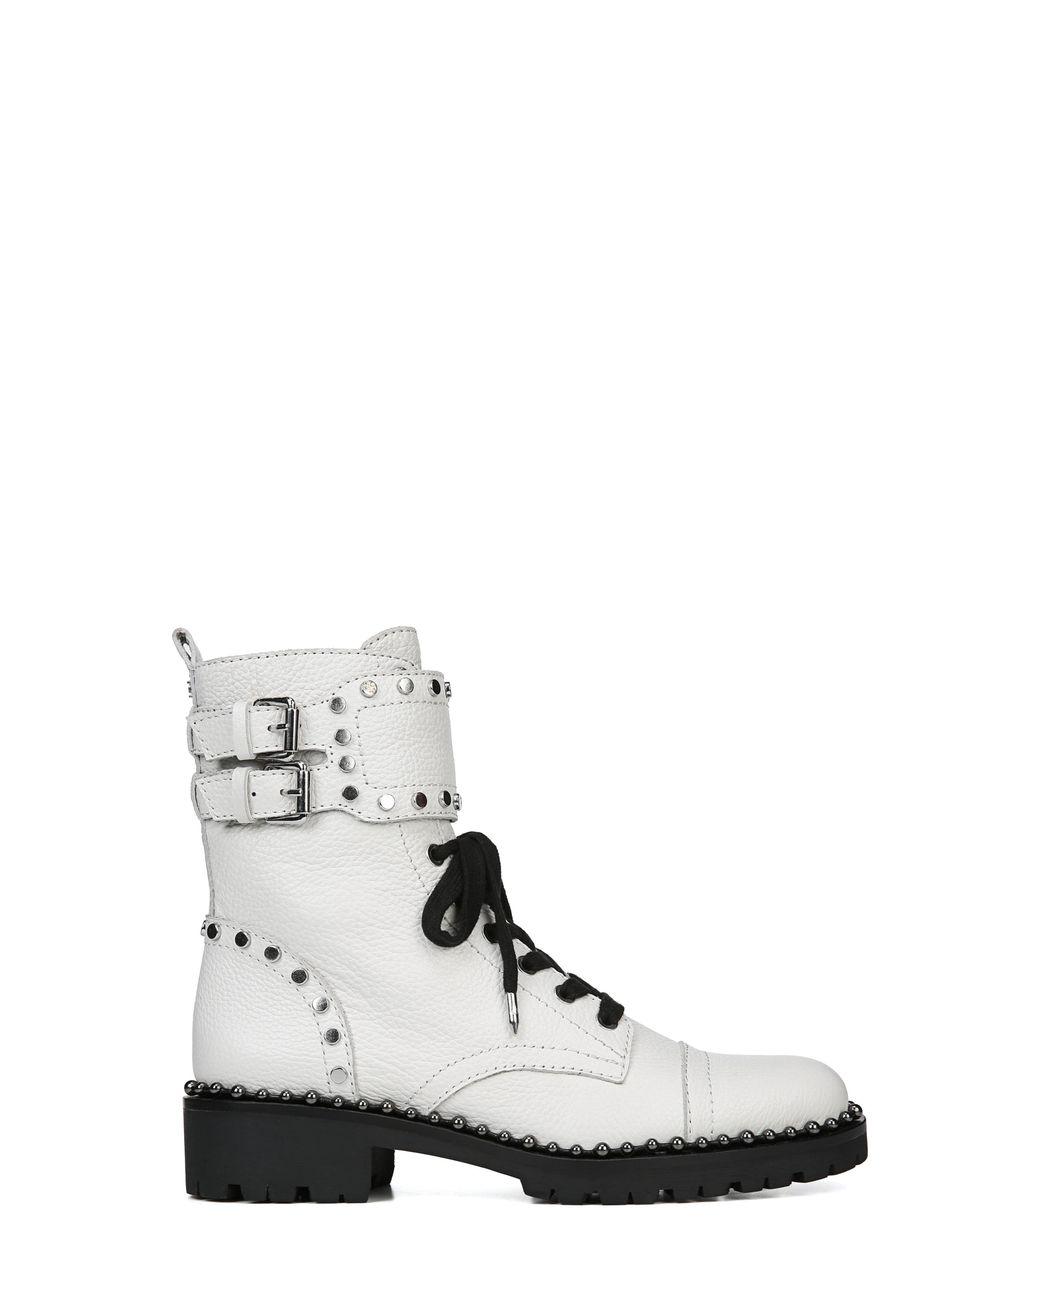 102b55a4c153 Lyst - Sam Edelman Jennifer Boot Black Leather in Black - Save 46%